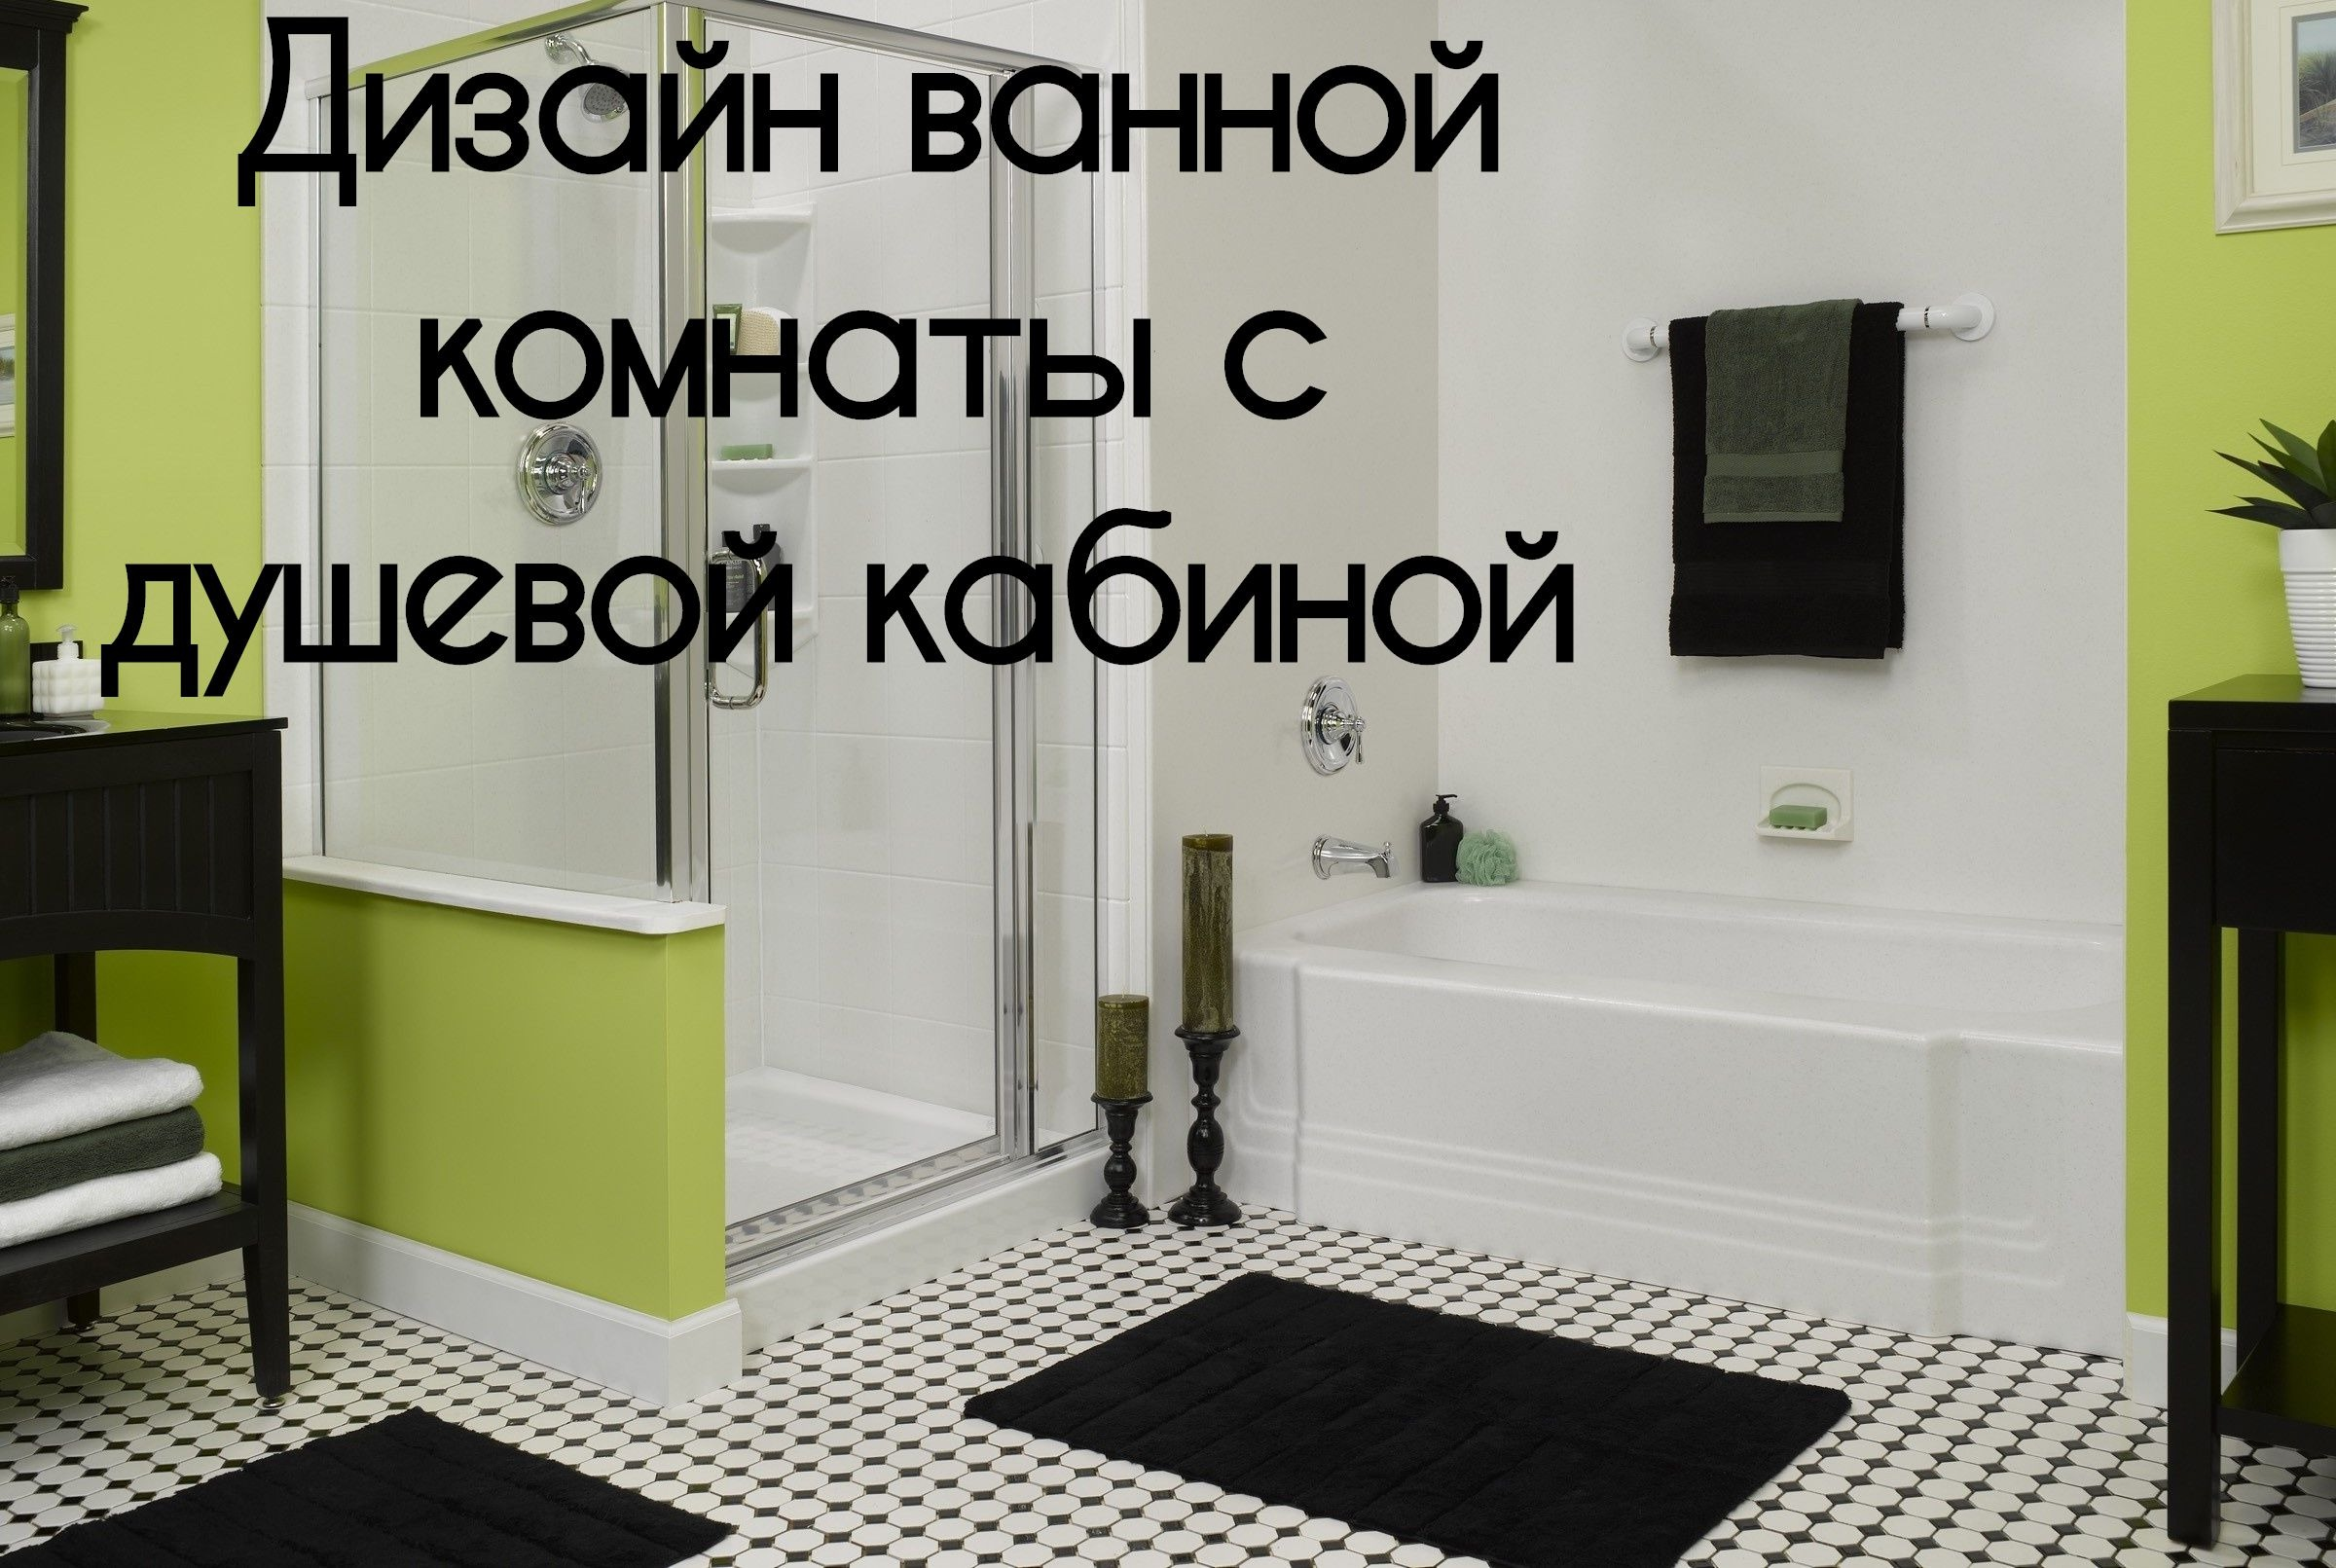 Душевая кабина зеленого цвета. ванна белого цвета.